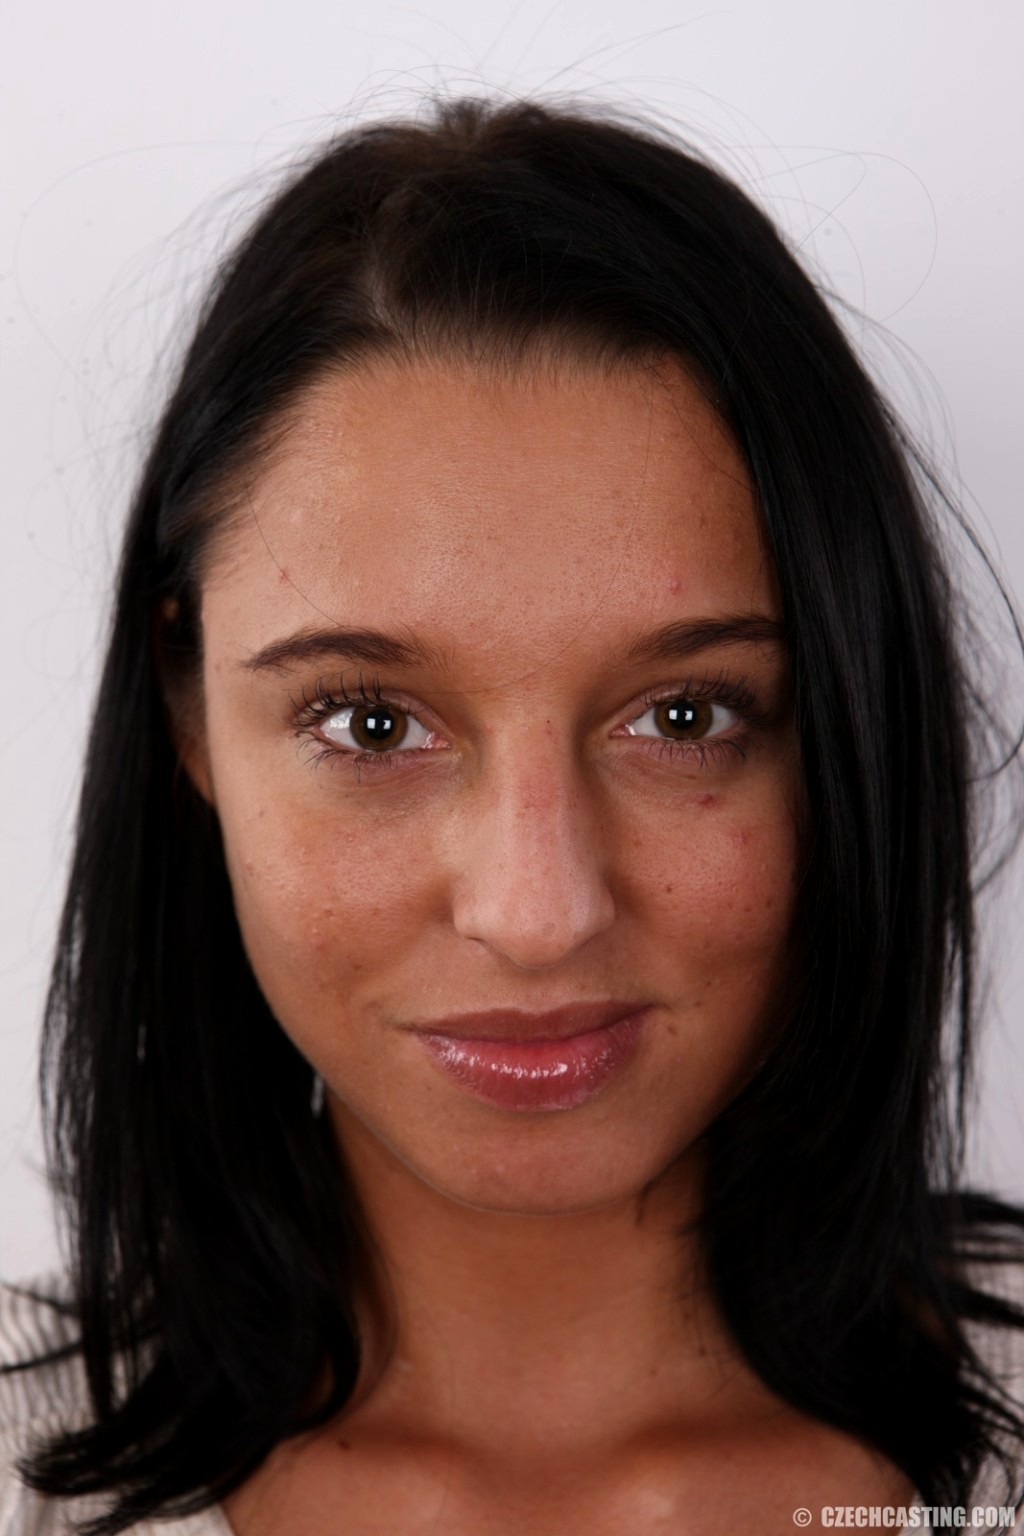 Czech Casting Czechcasting Model Brand New Girlfriends